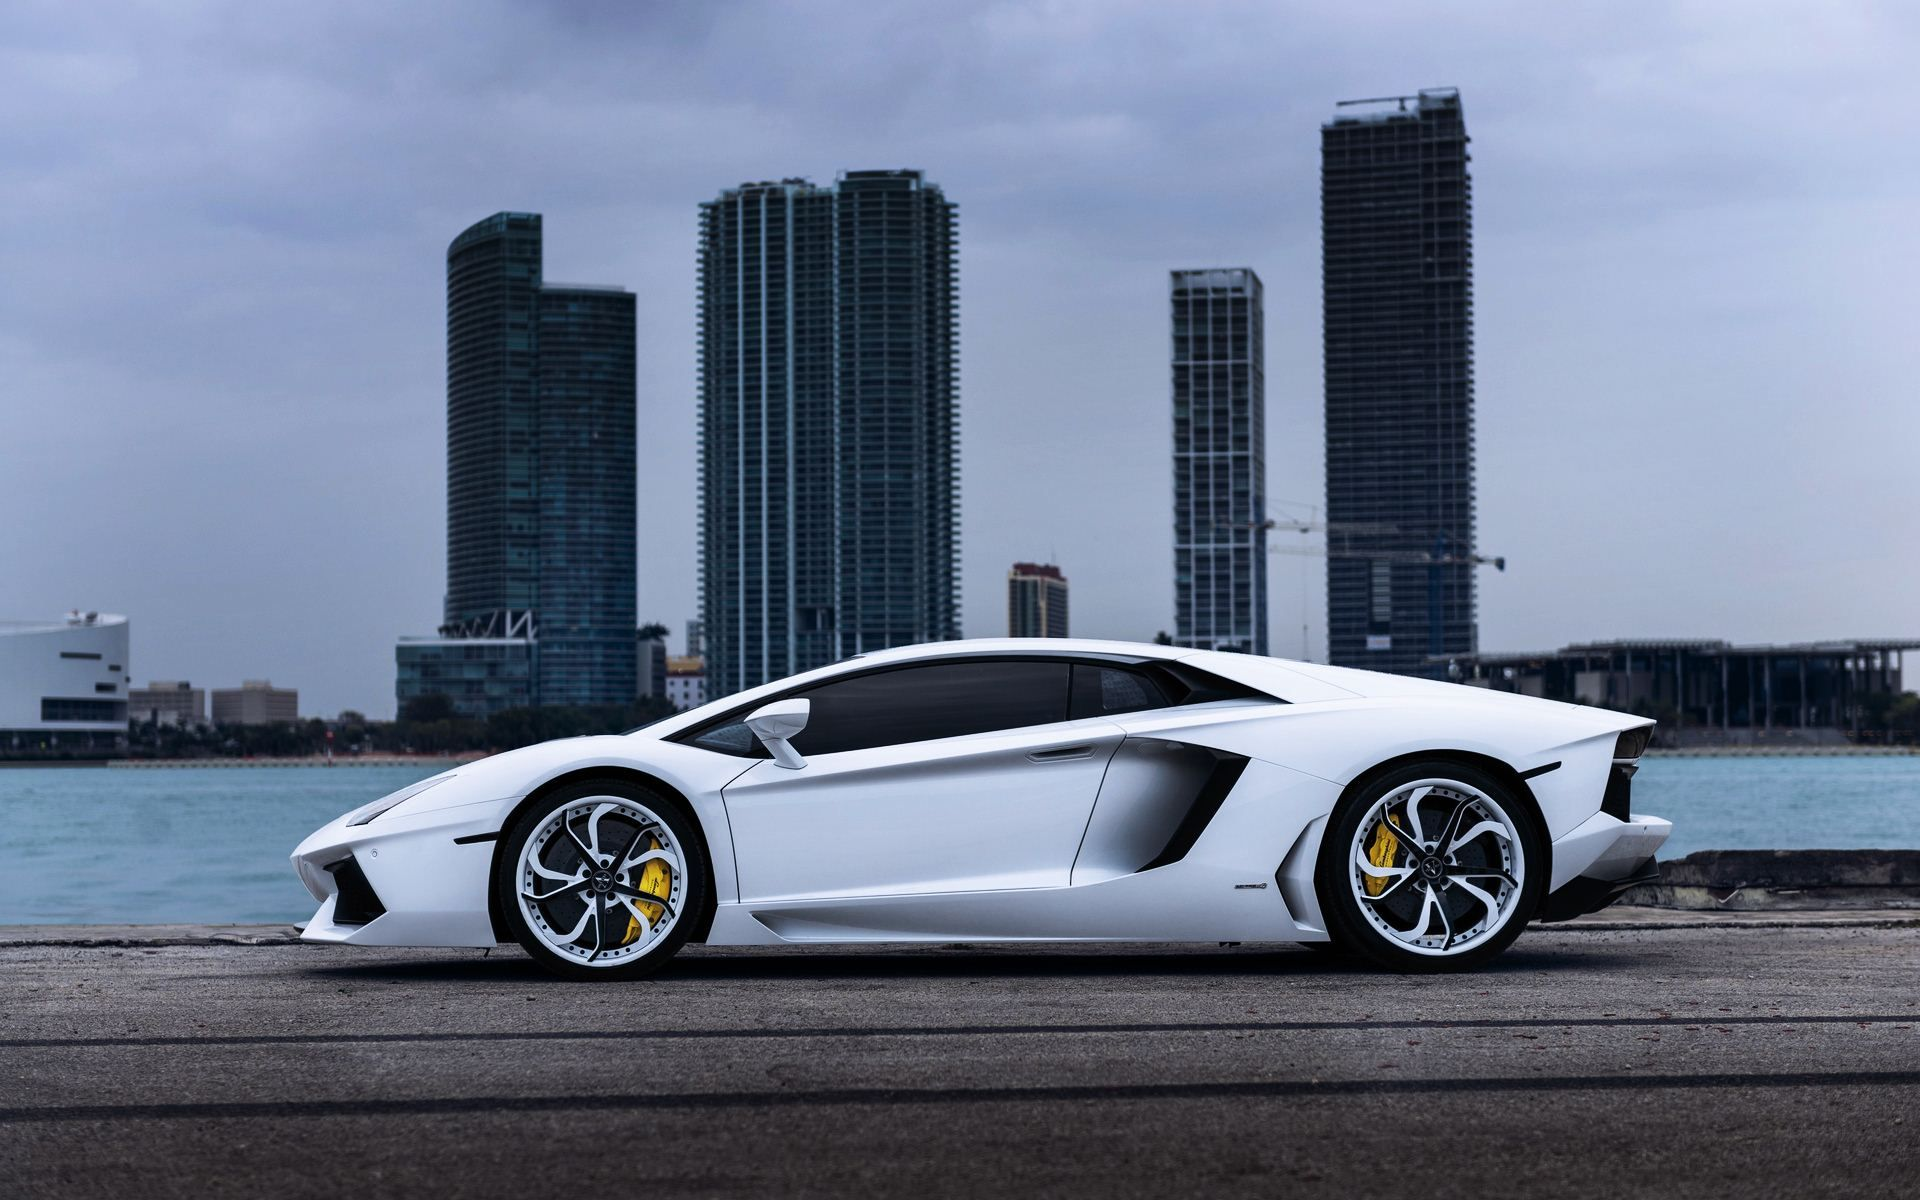 Lamborghini Huracan Wallpapers Phone Vehicles Wallpapers